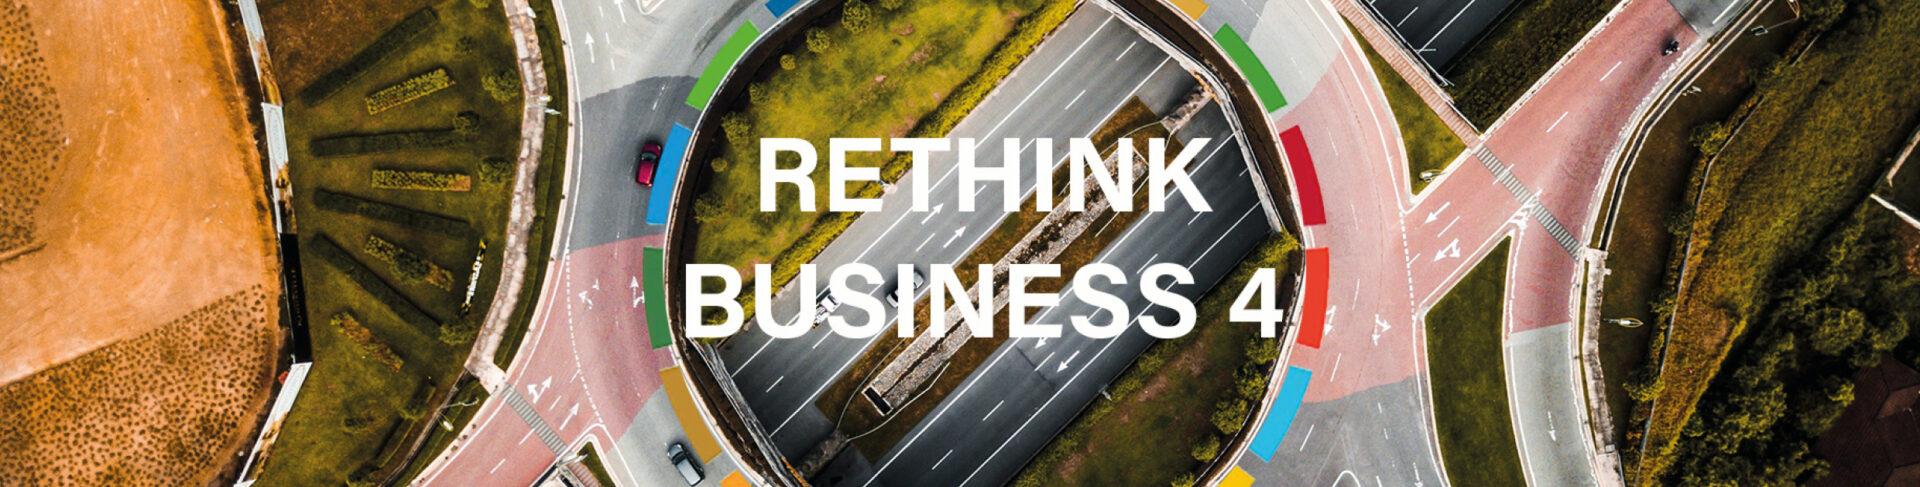 rethink-business-4